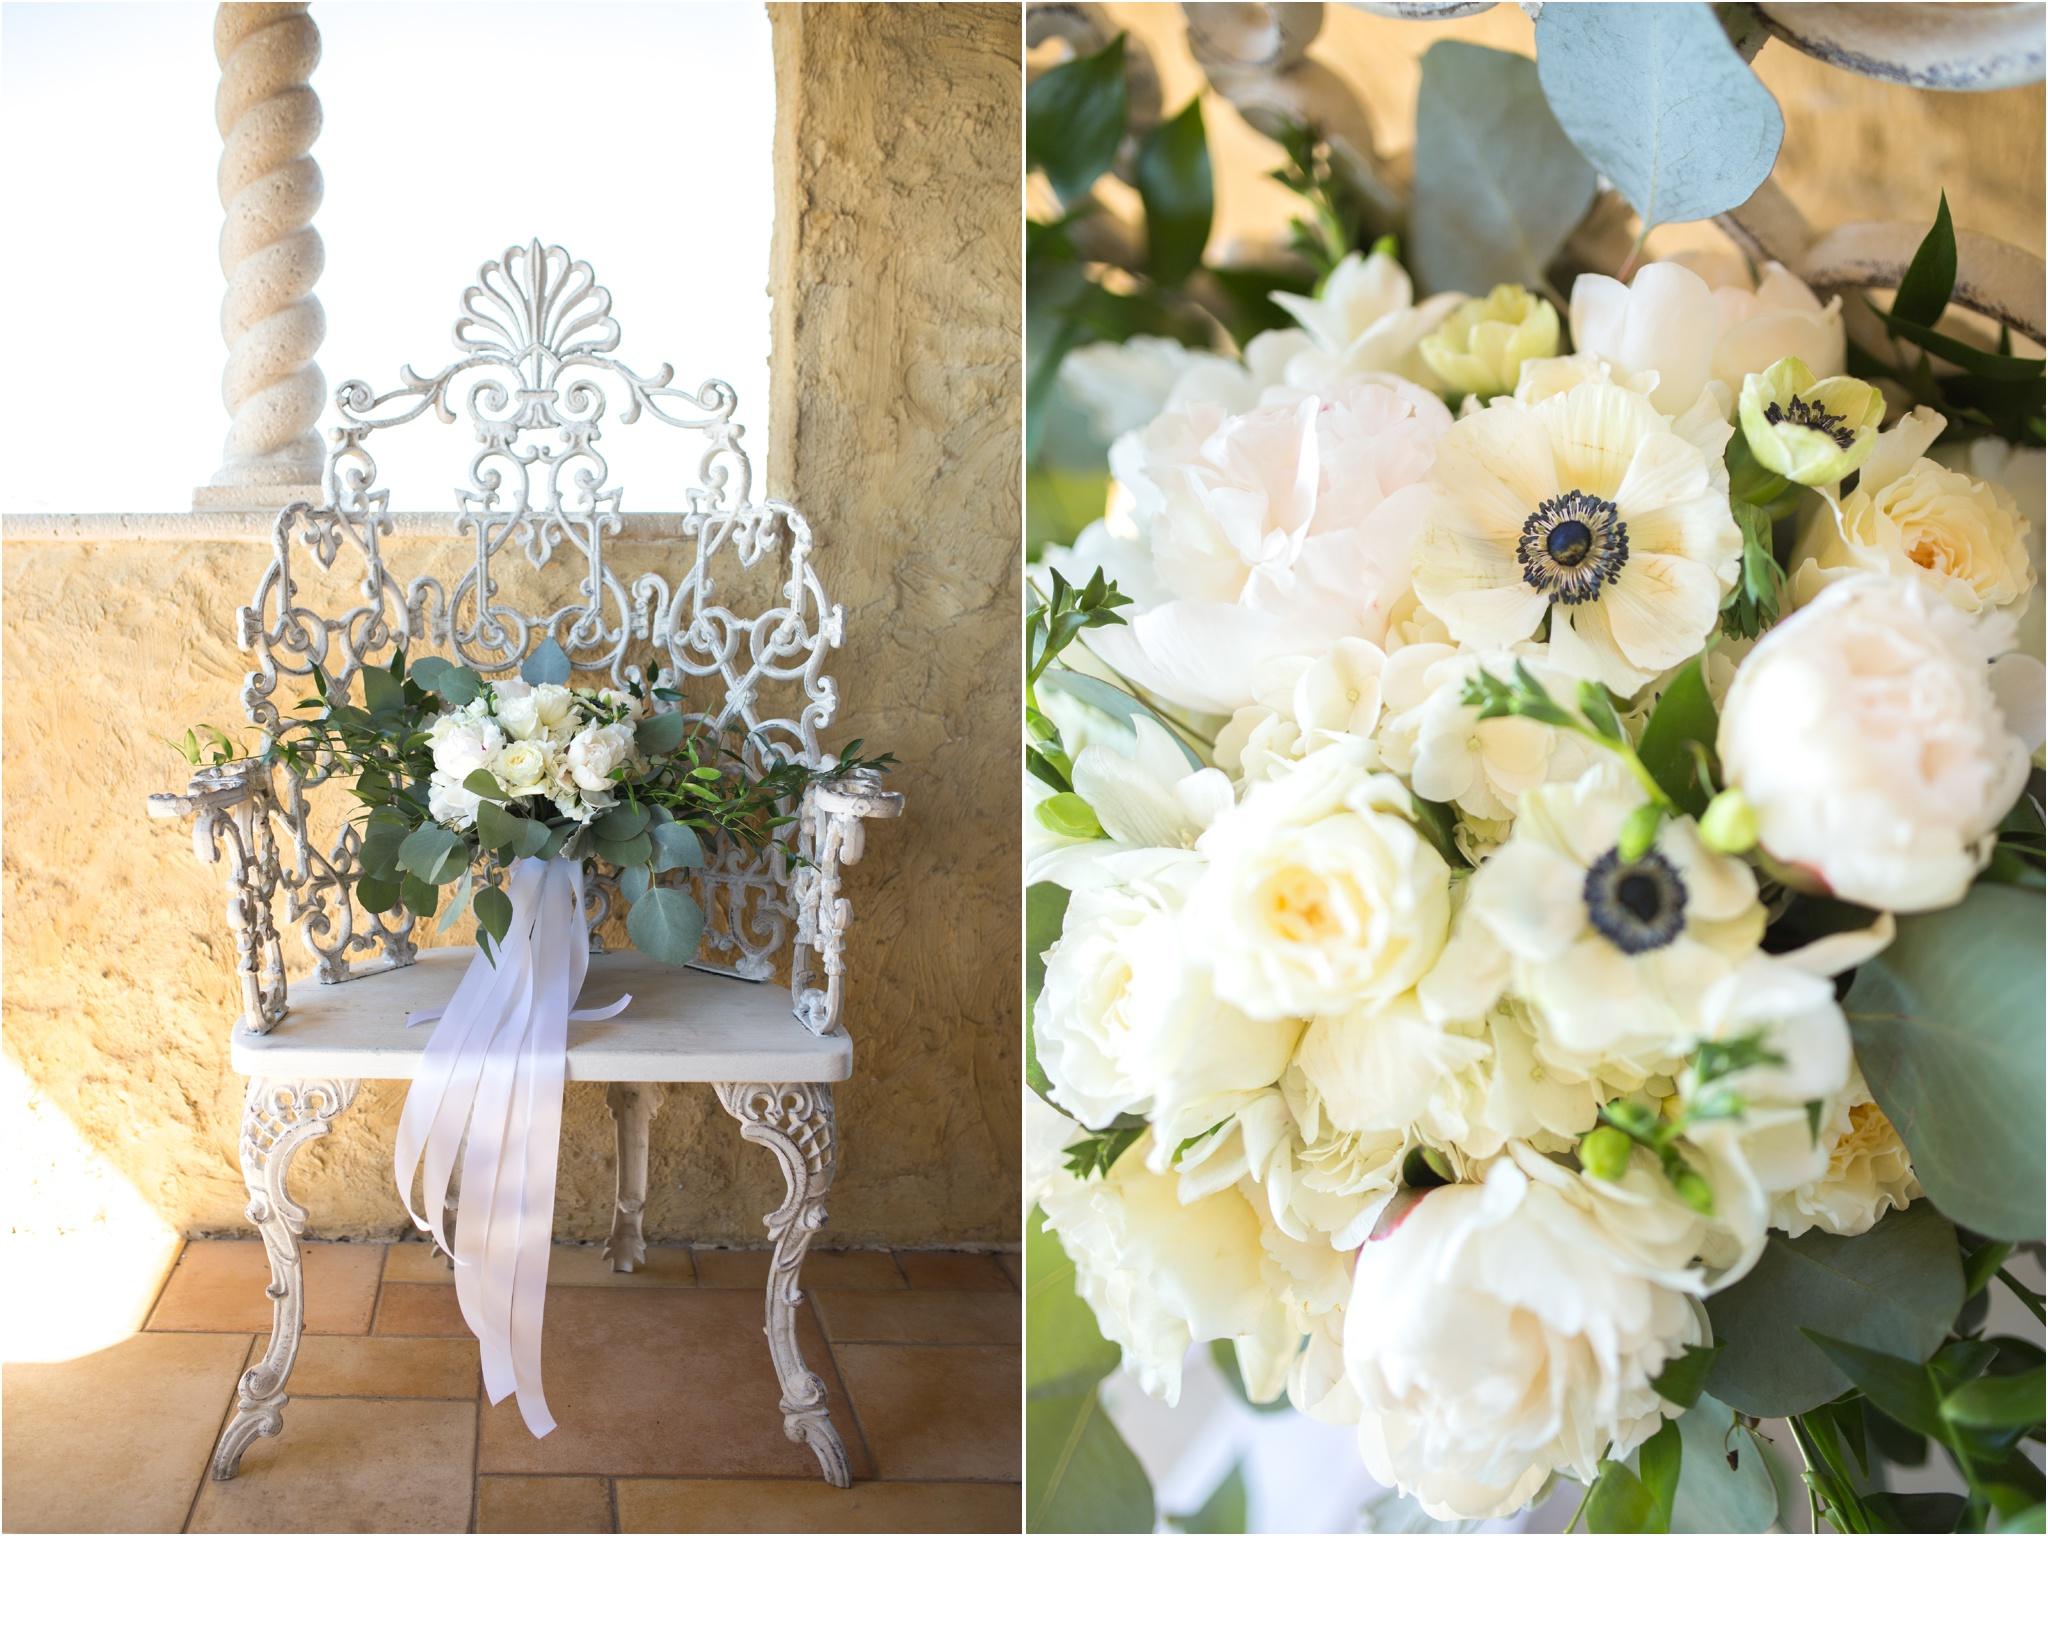 Rainey_Gregg_Photography_St._Simons_Island_Georgia_California_Wedding_Portrait_Photography_0631.jpg